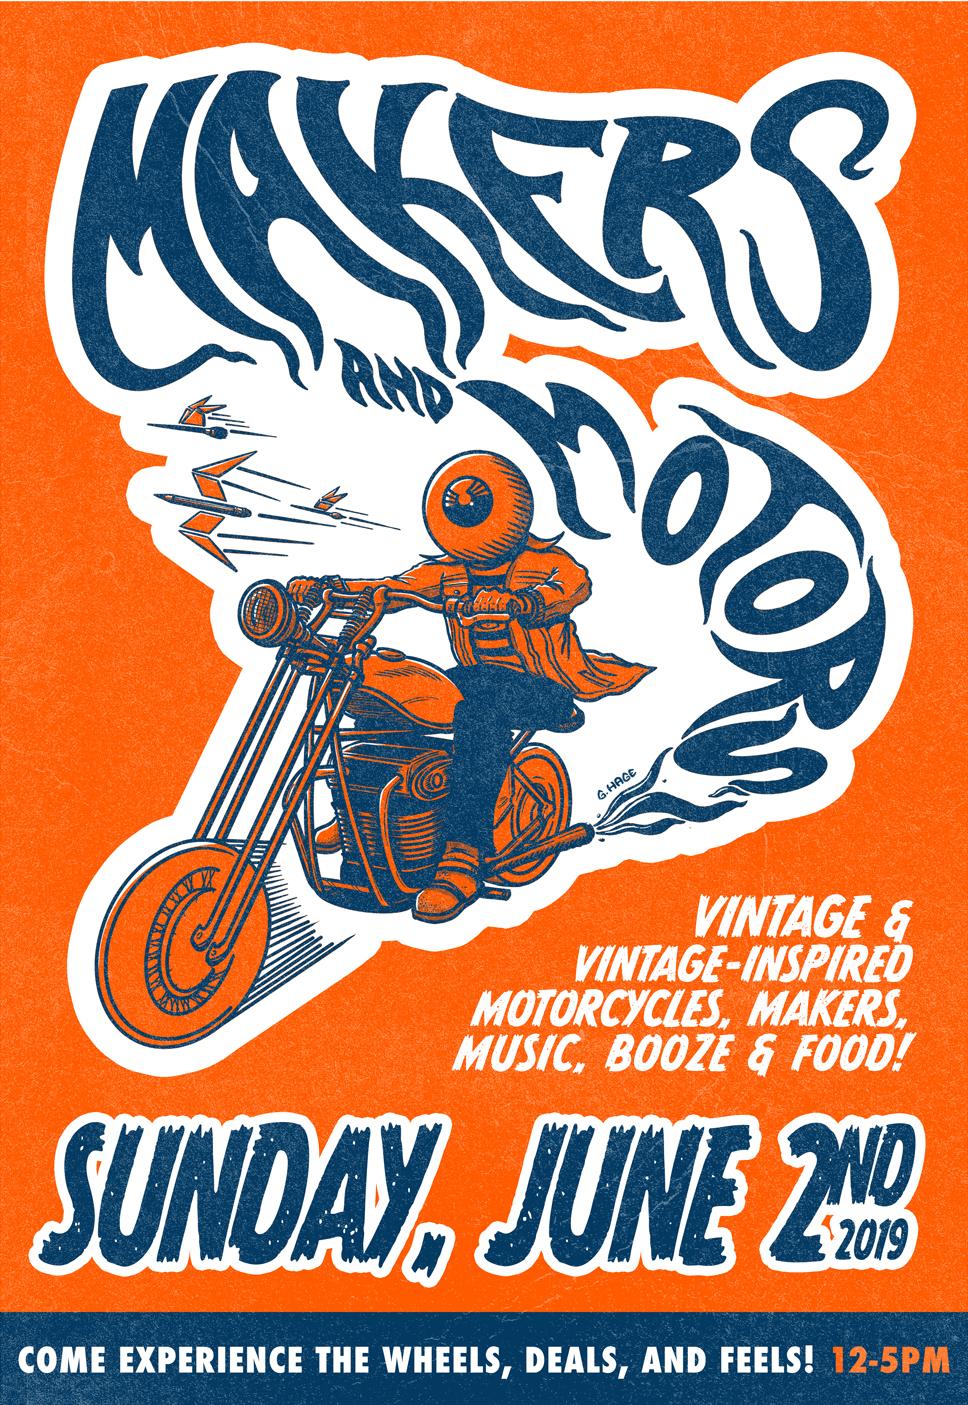 Makers & Motors at Edge of Urge, Sunday, June 2, 2019